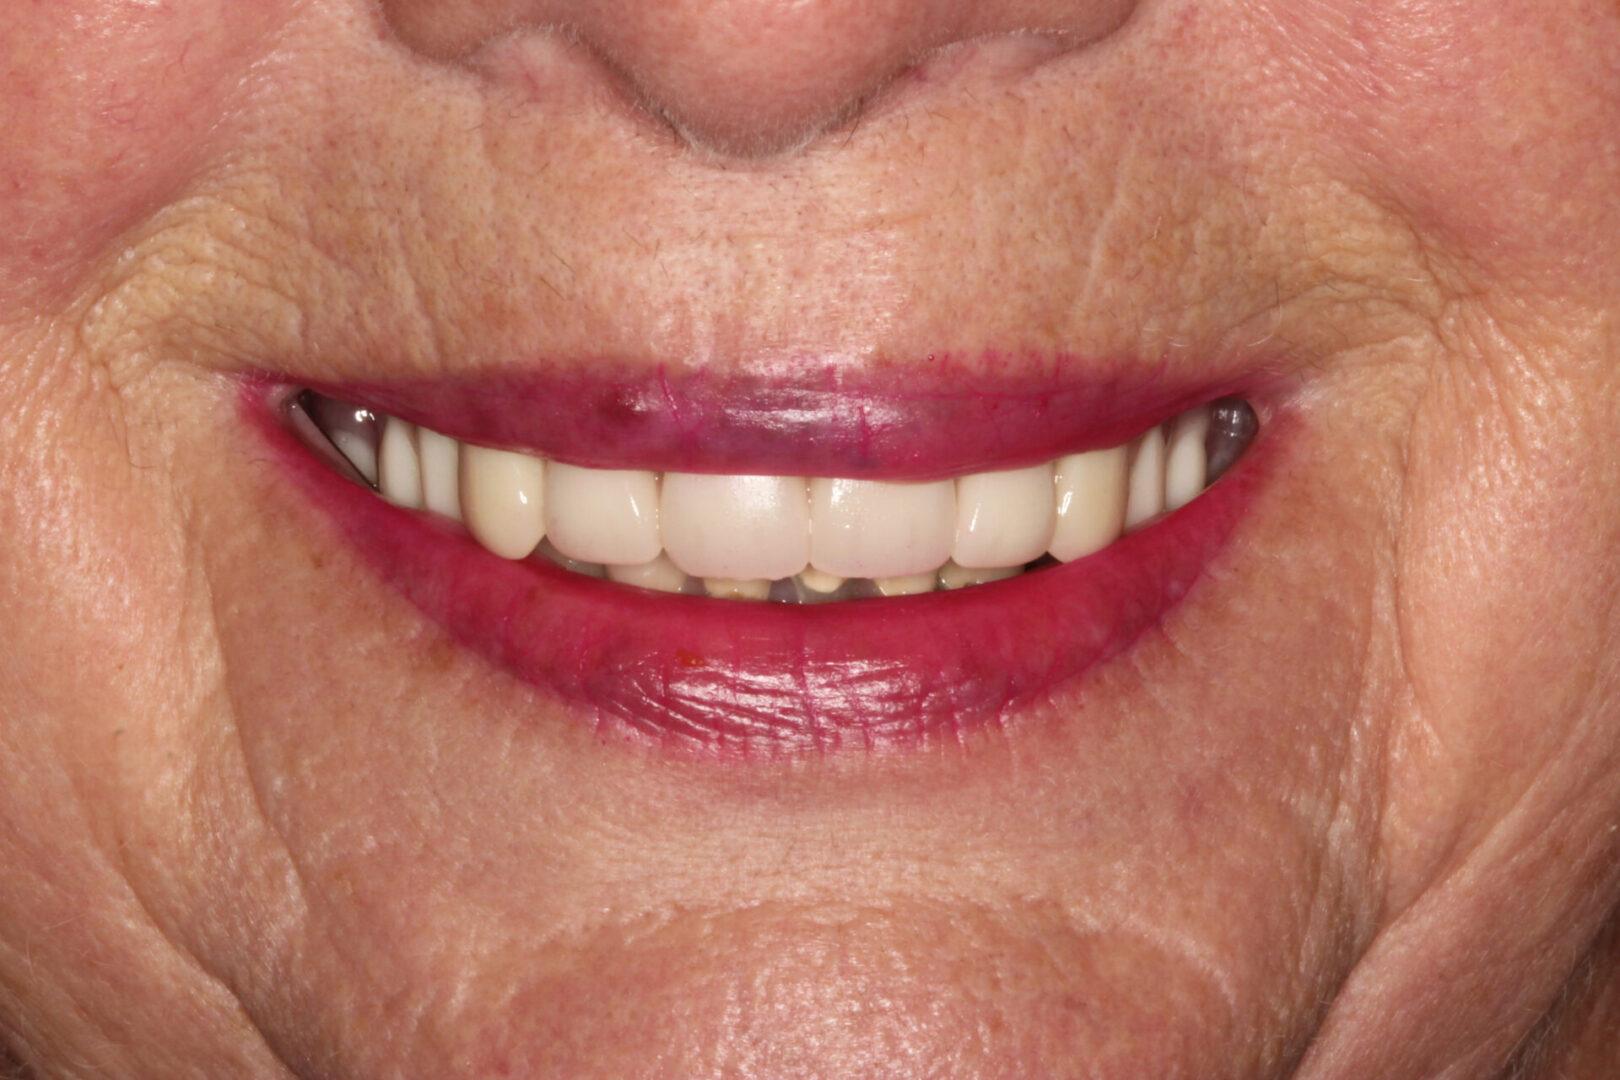 Teeth needing restorations and dentures